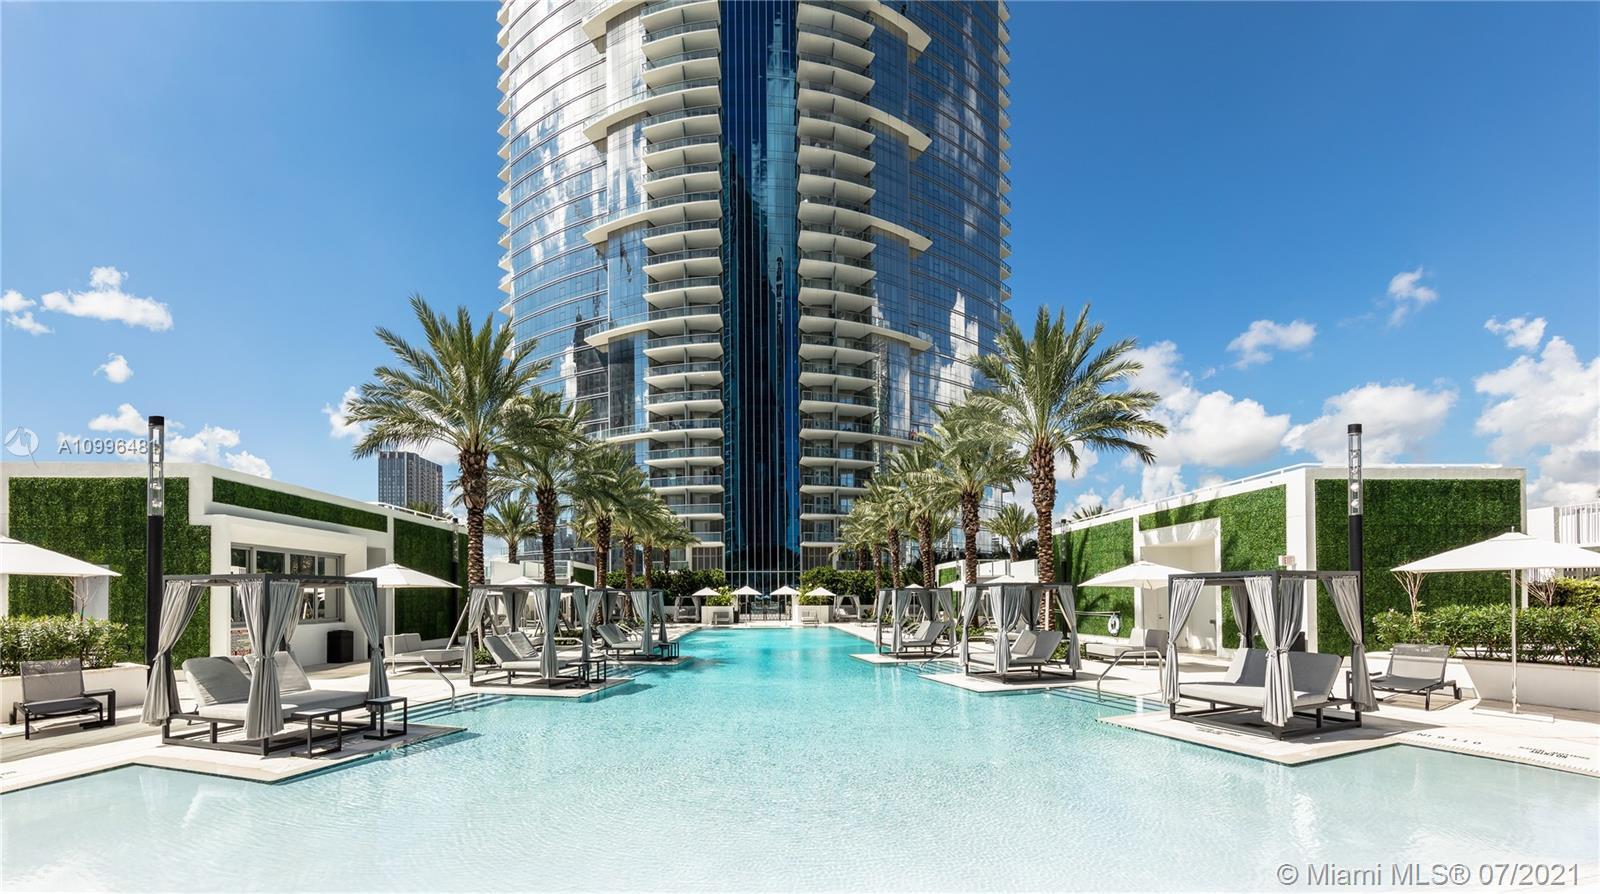 Paramount Miami Worldcenter #2207 - 851 NE 1st Ave #2207, Miami, FL 33132